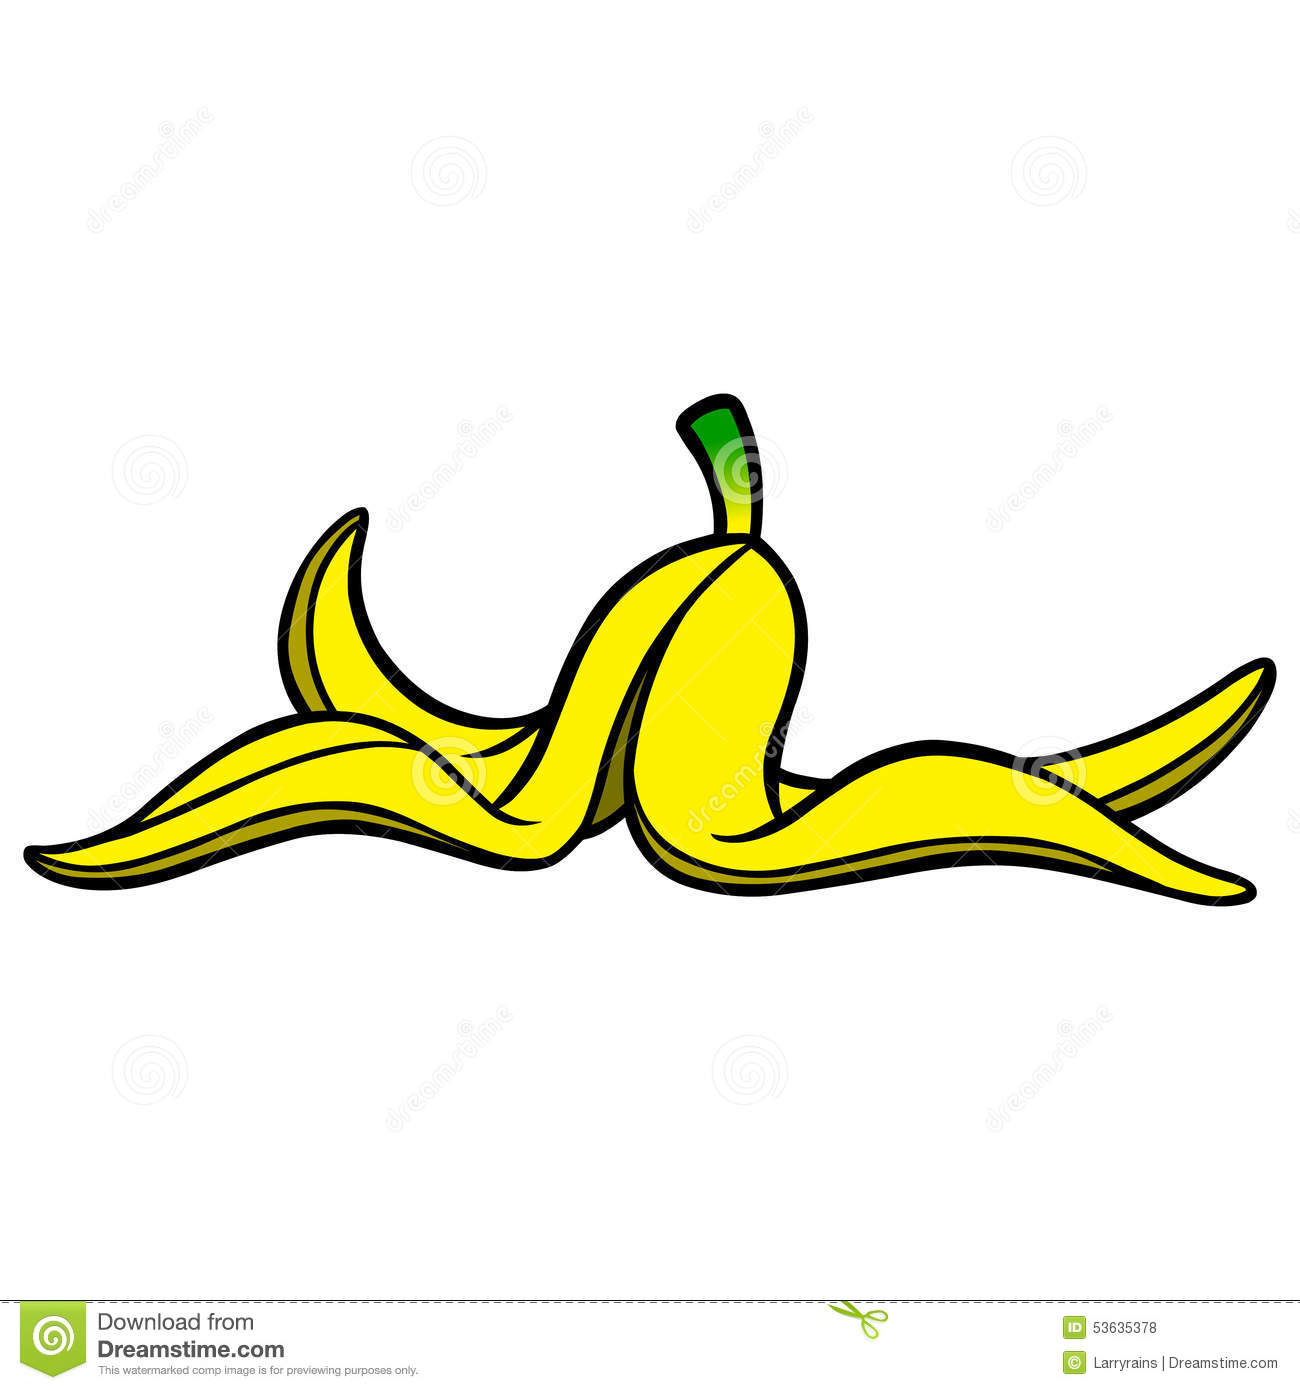 Banana clipart illustration. Peeled peel cartoon